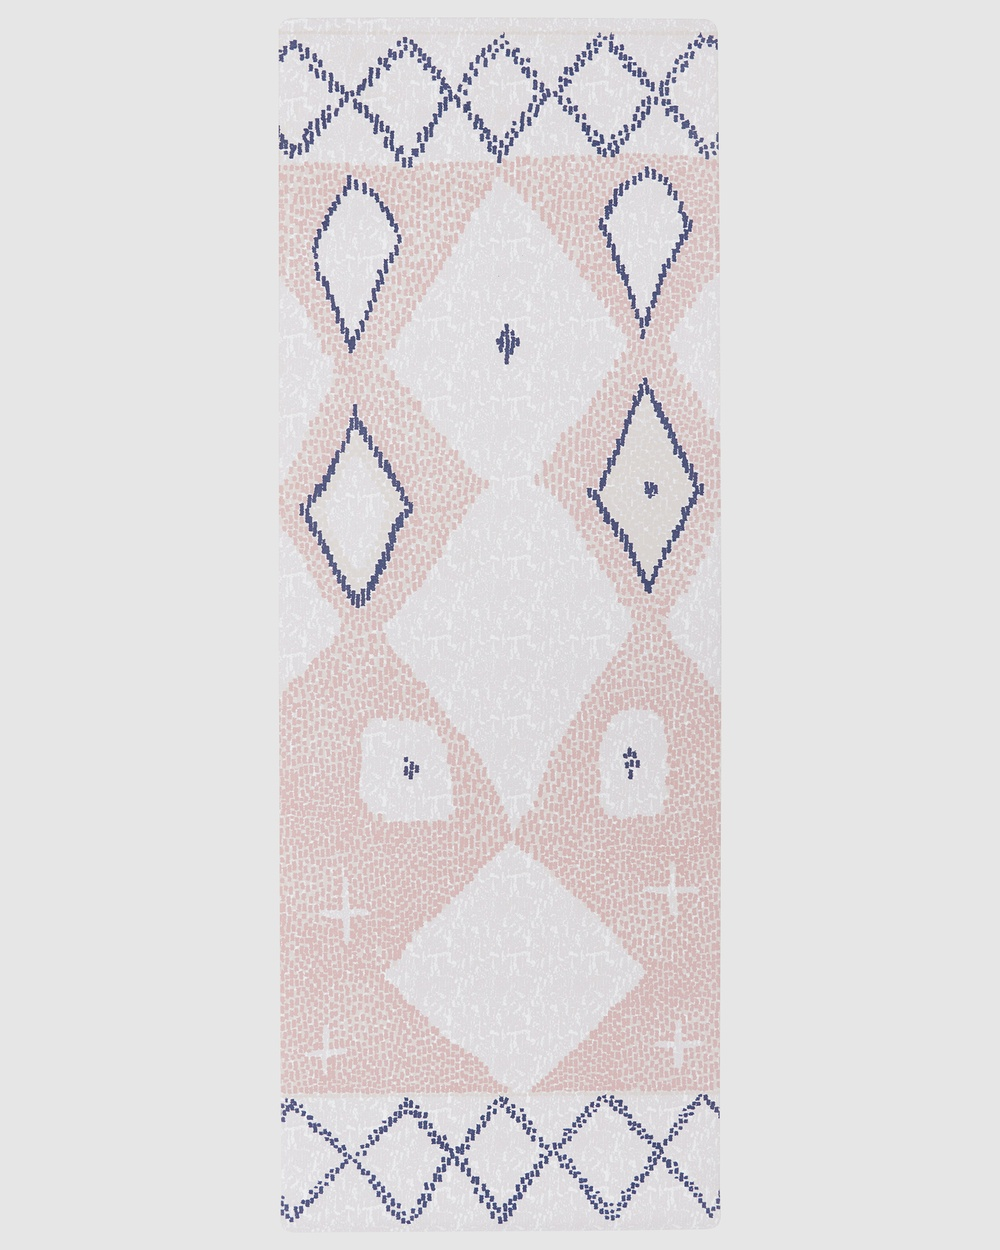 Yin Yoga Mats Ourain Mat Novelty Gifts Pink